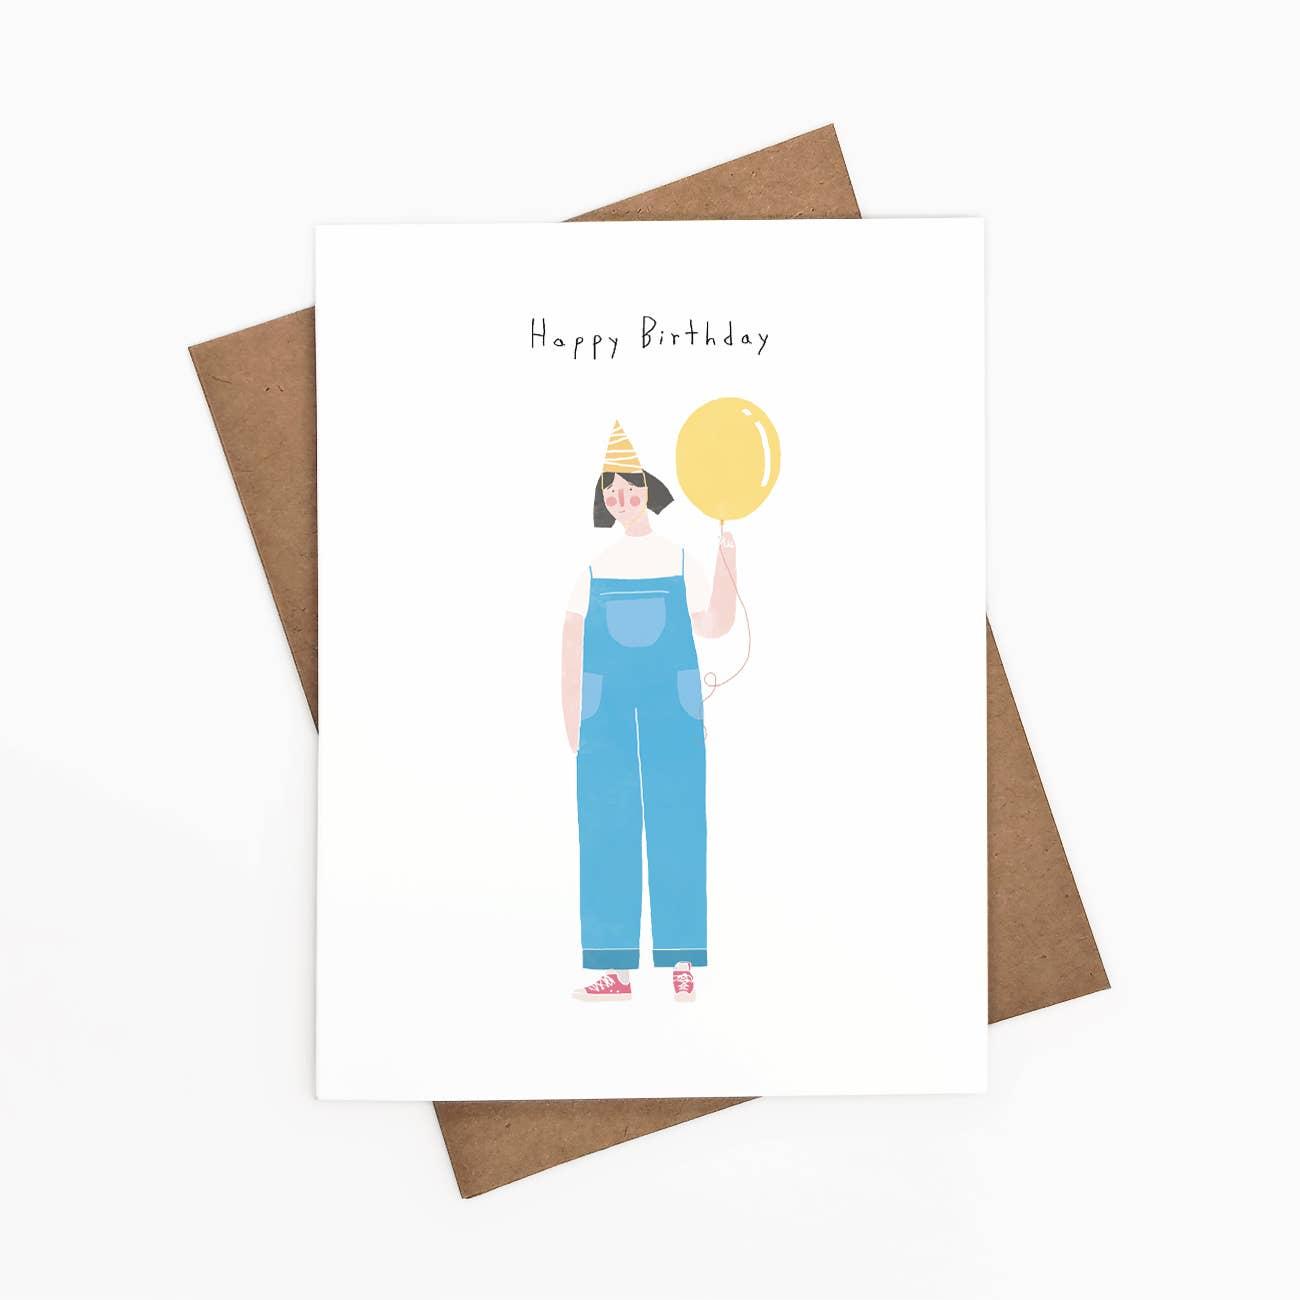 Happy Birthday Greeting Card - Overalls   Trada Marketplace